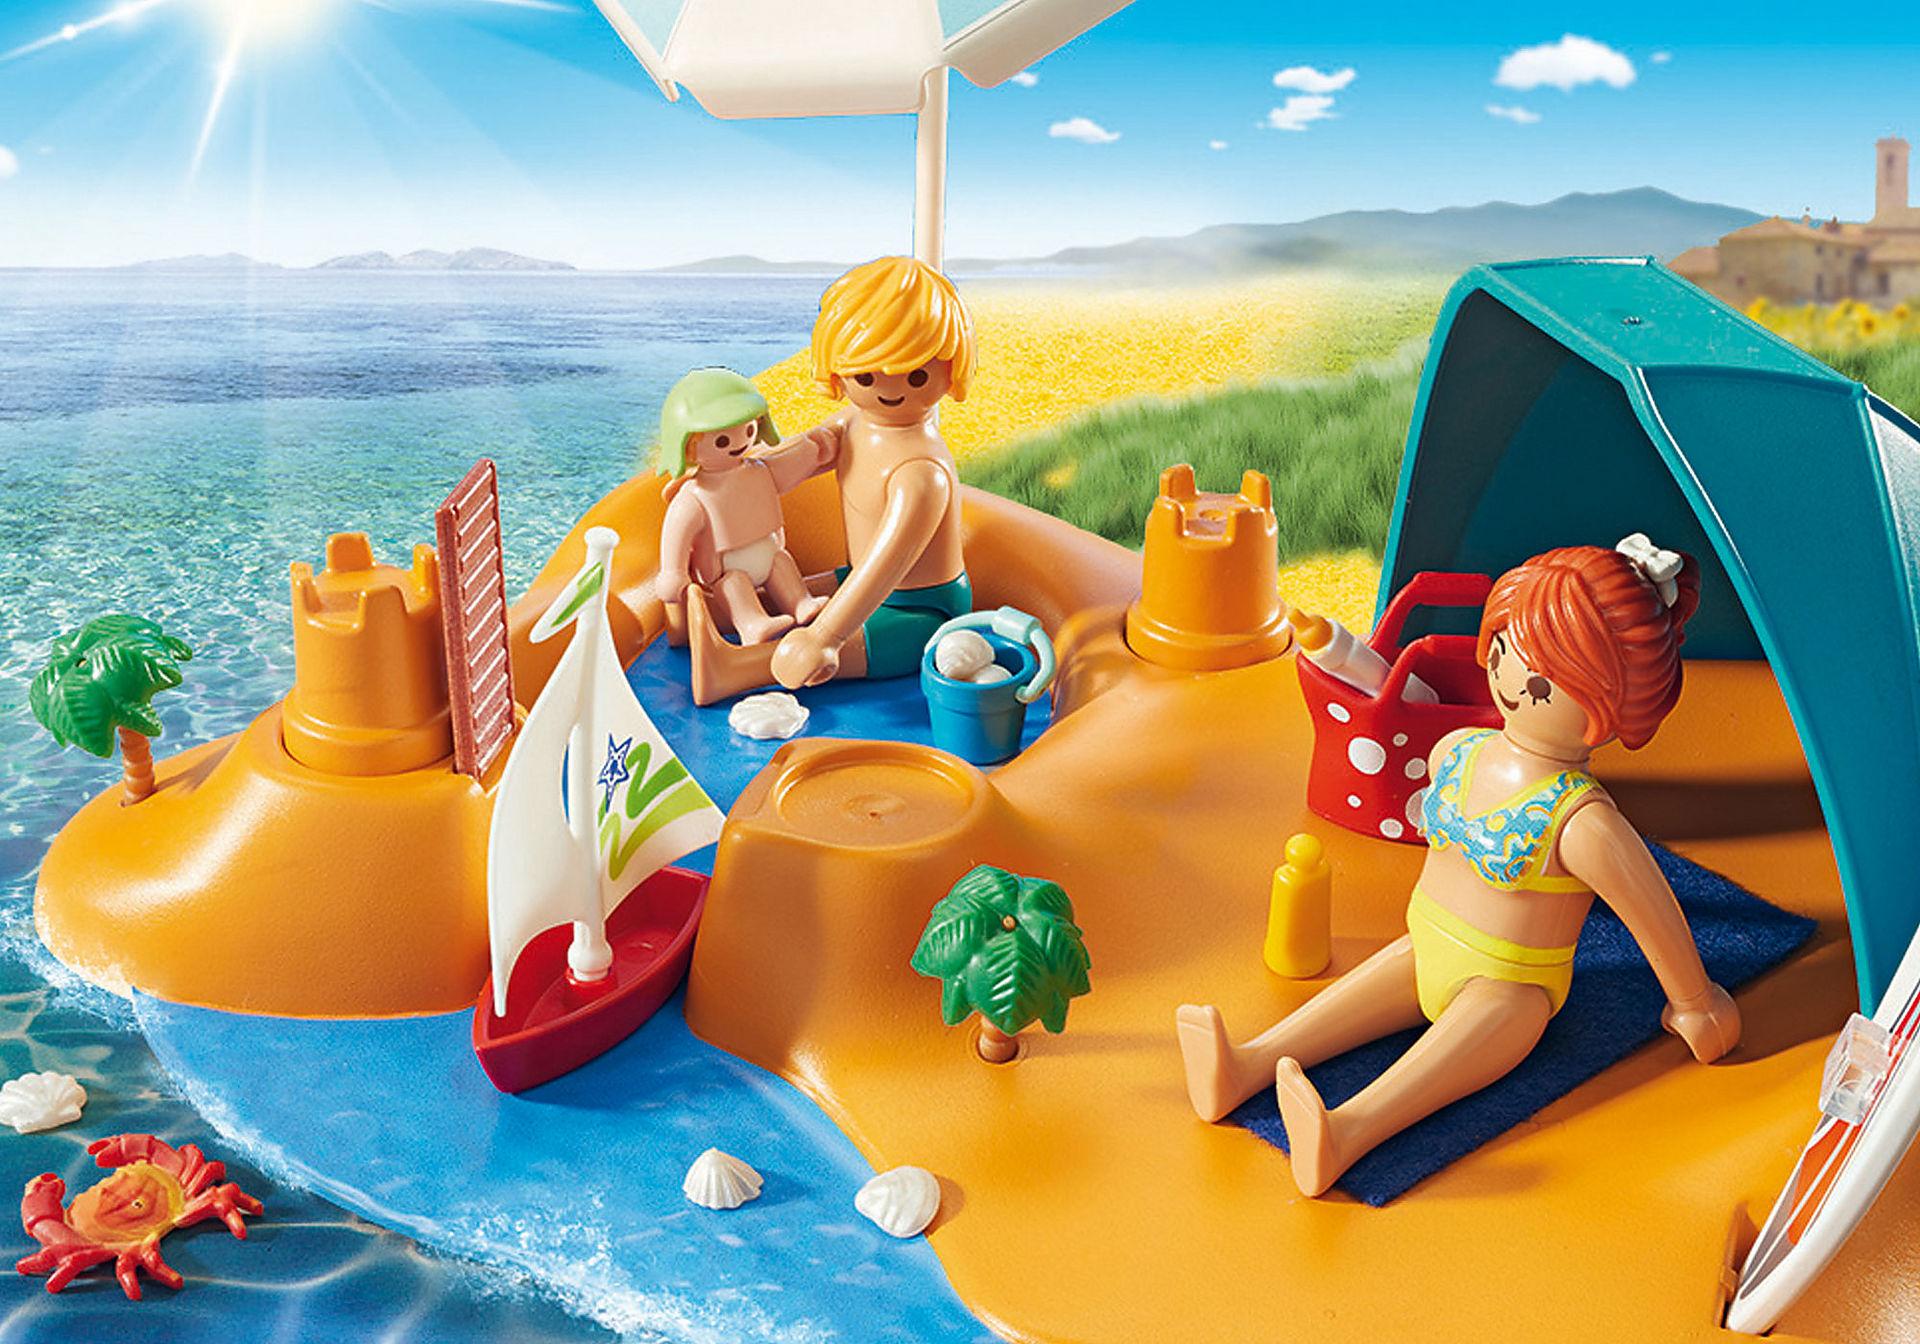 http://media.playmobil.com/i/playmobil/9425_product_extra2/Οικογενειακή διασκέδαση στην παραλία